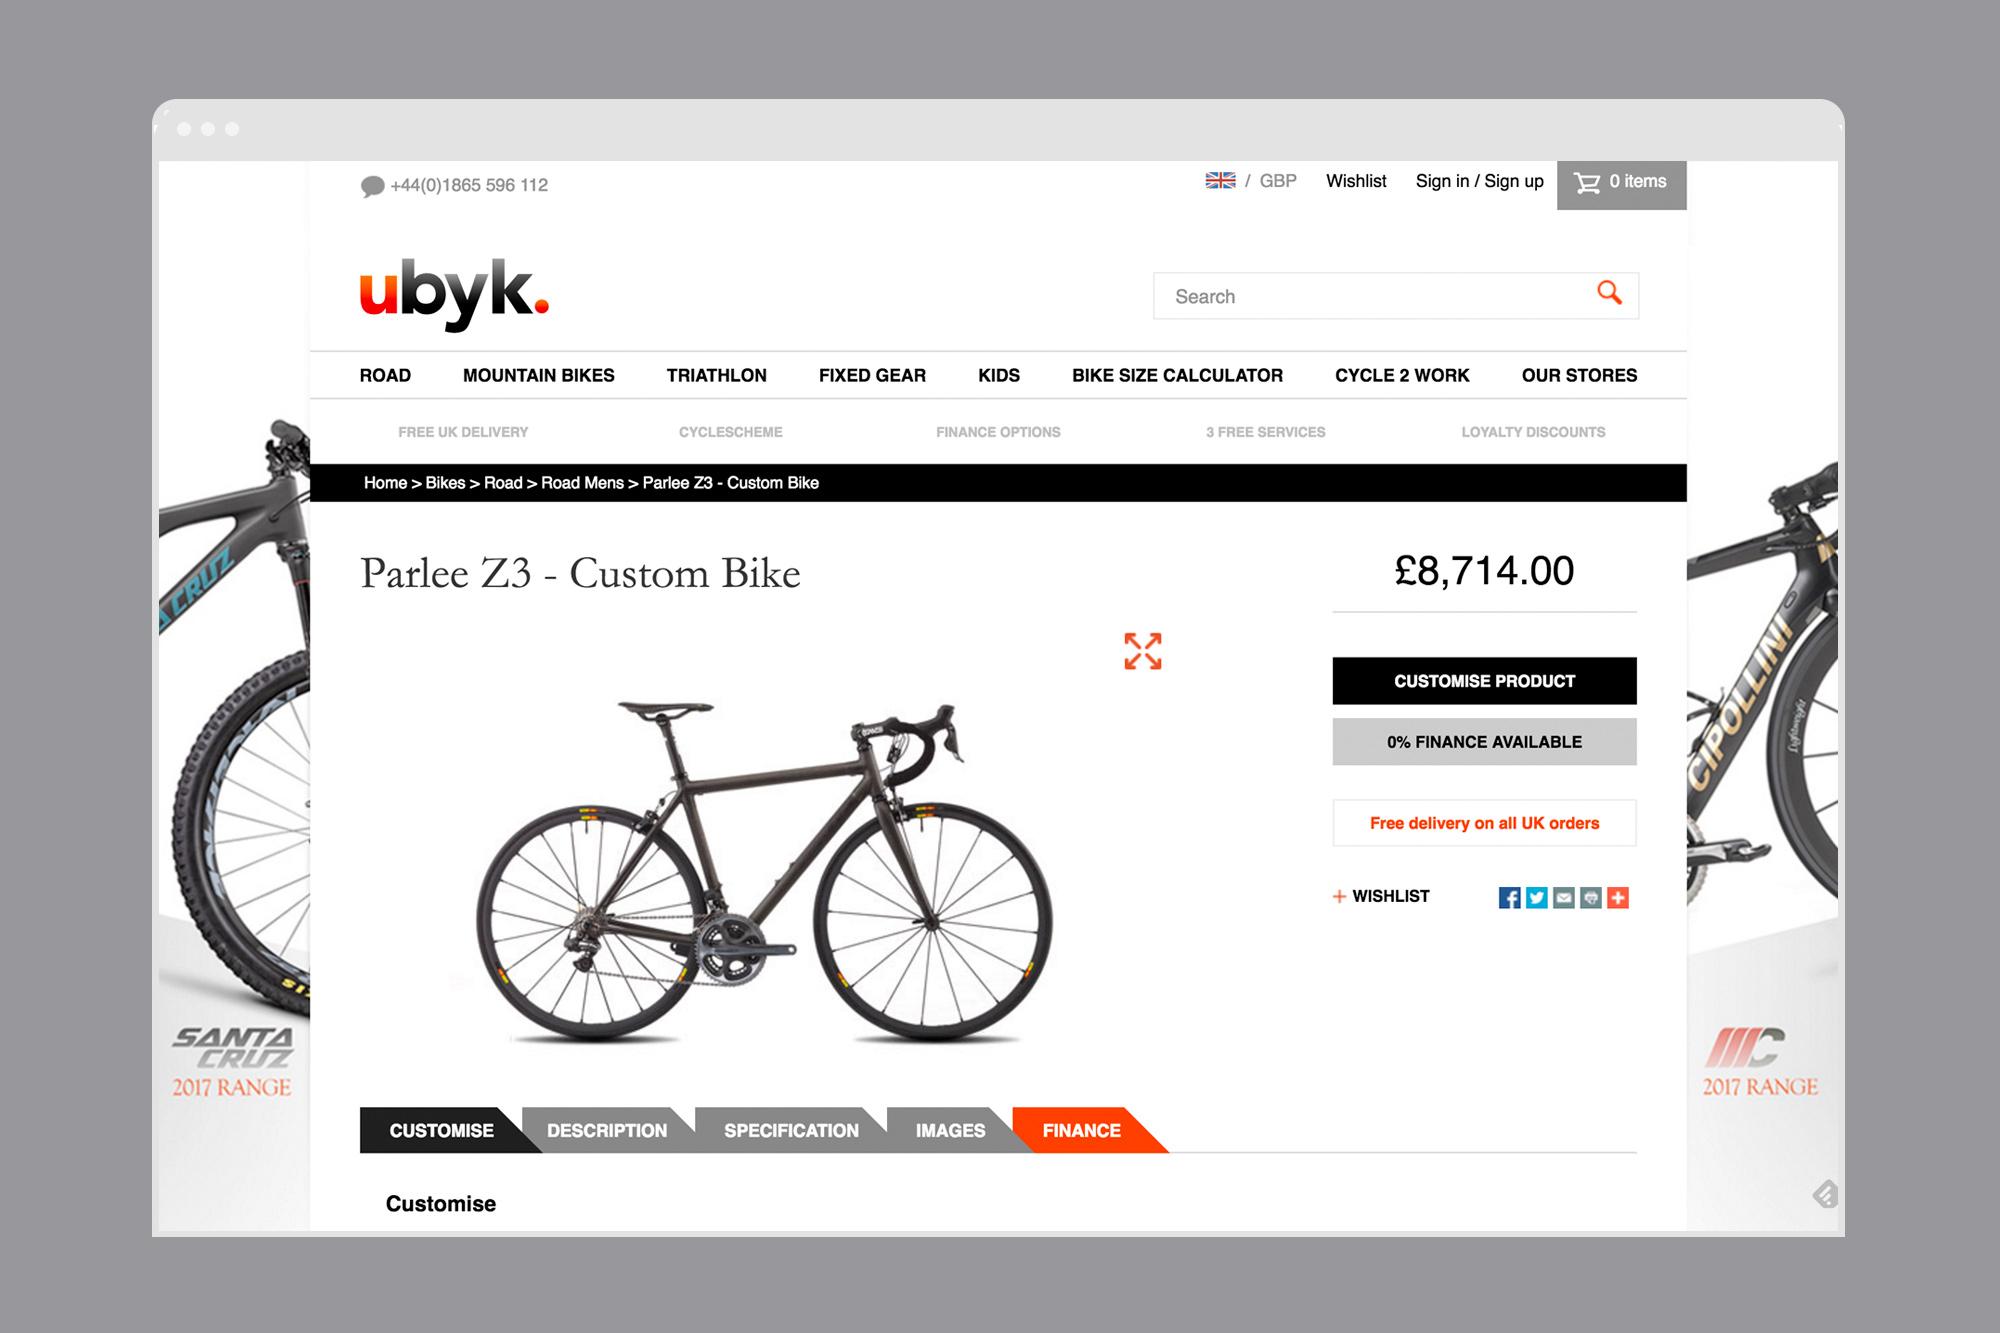 gpj_ubyk_website_v4